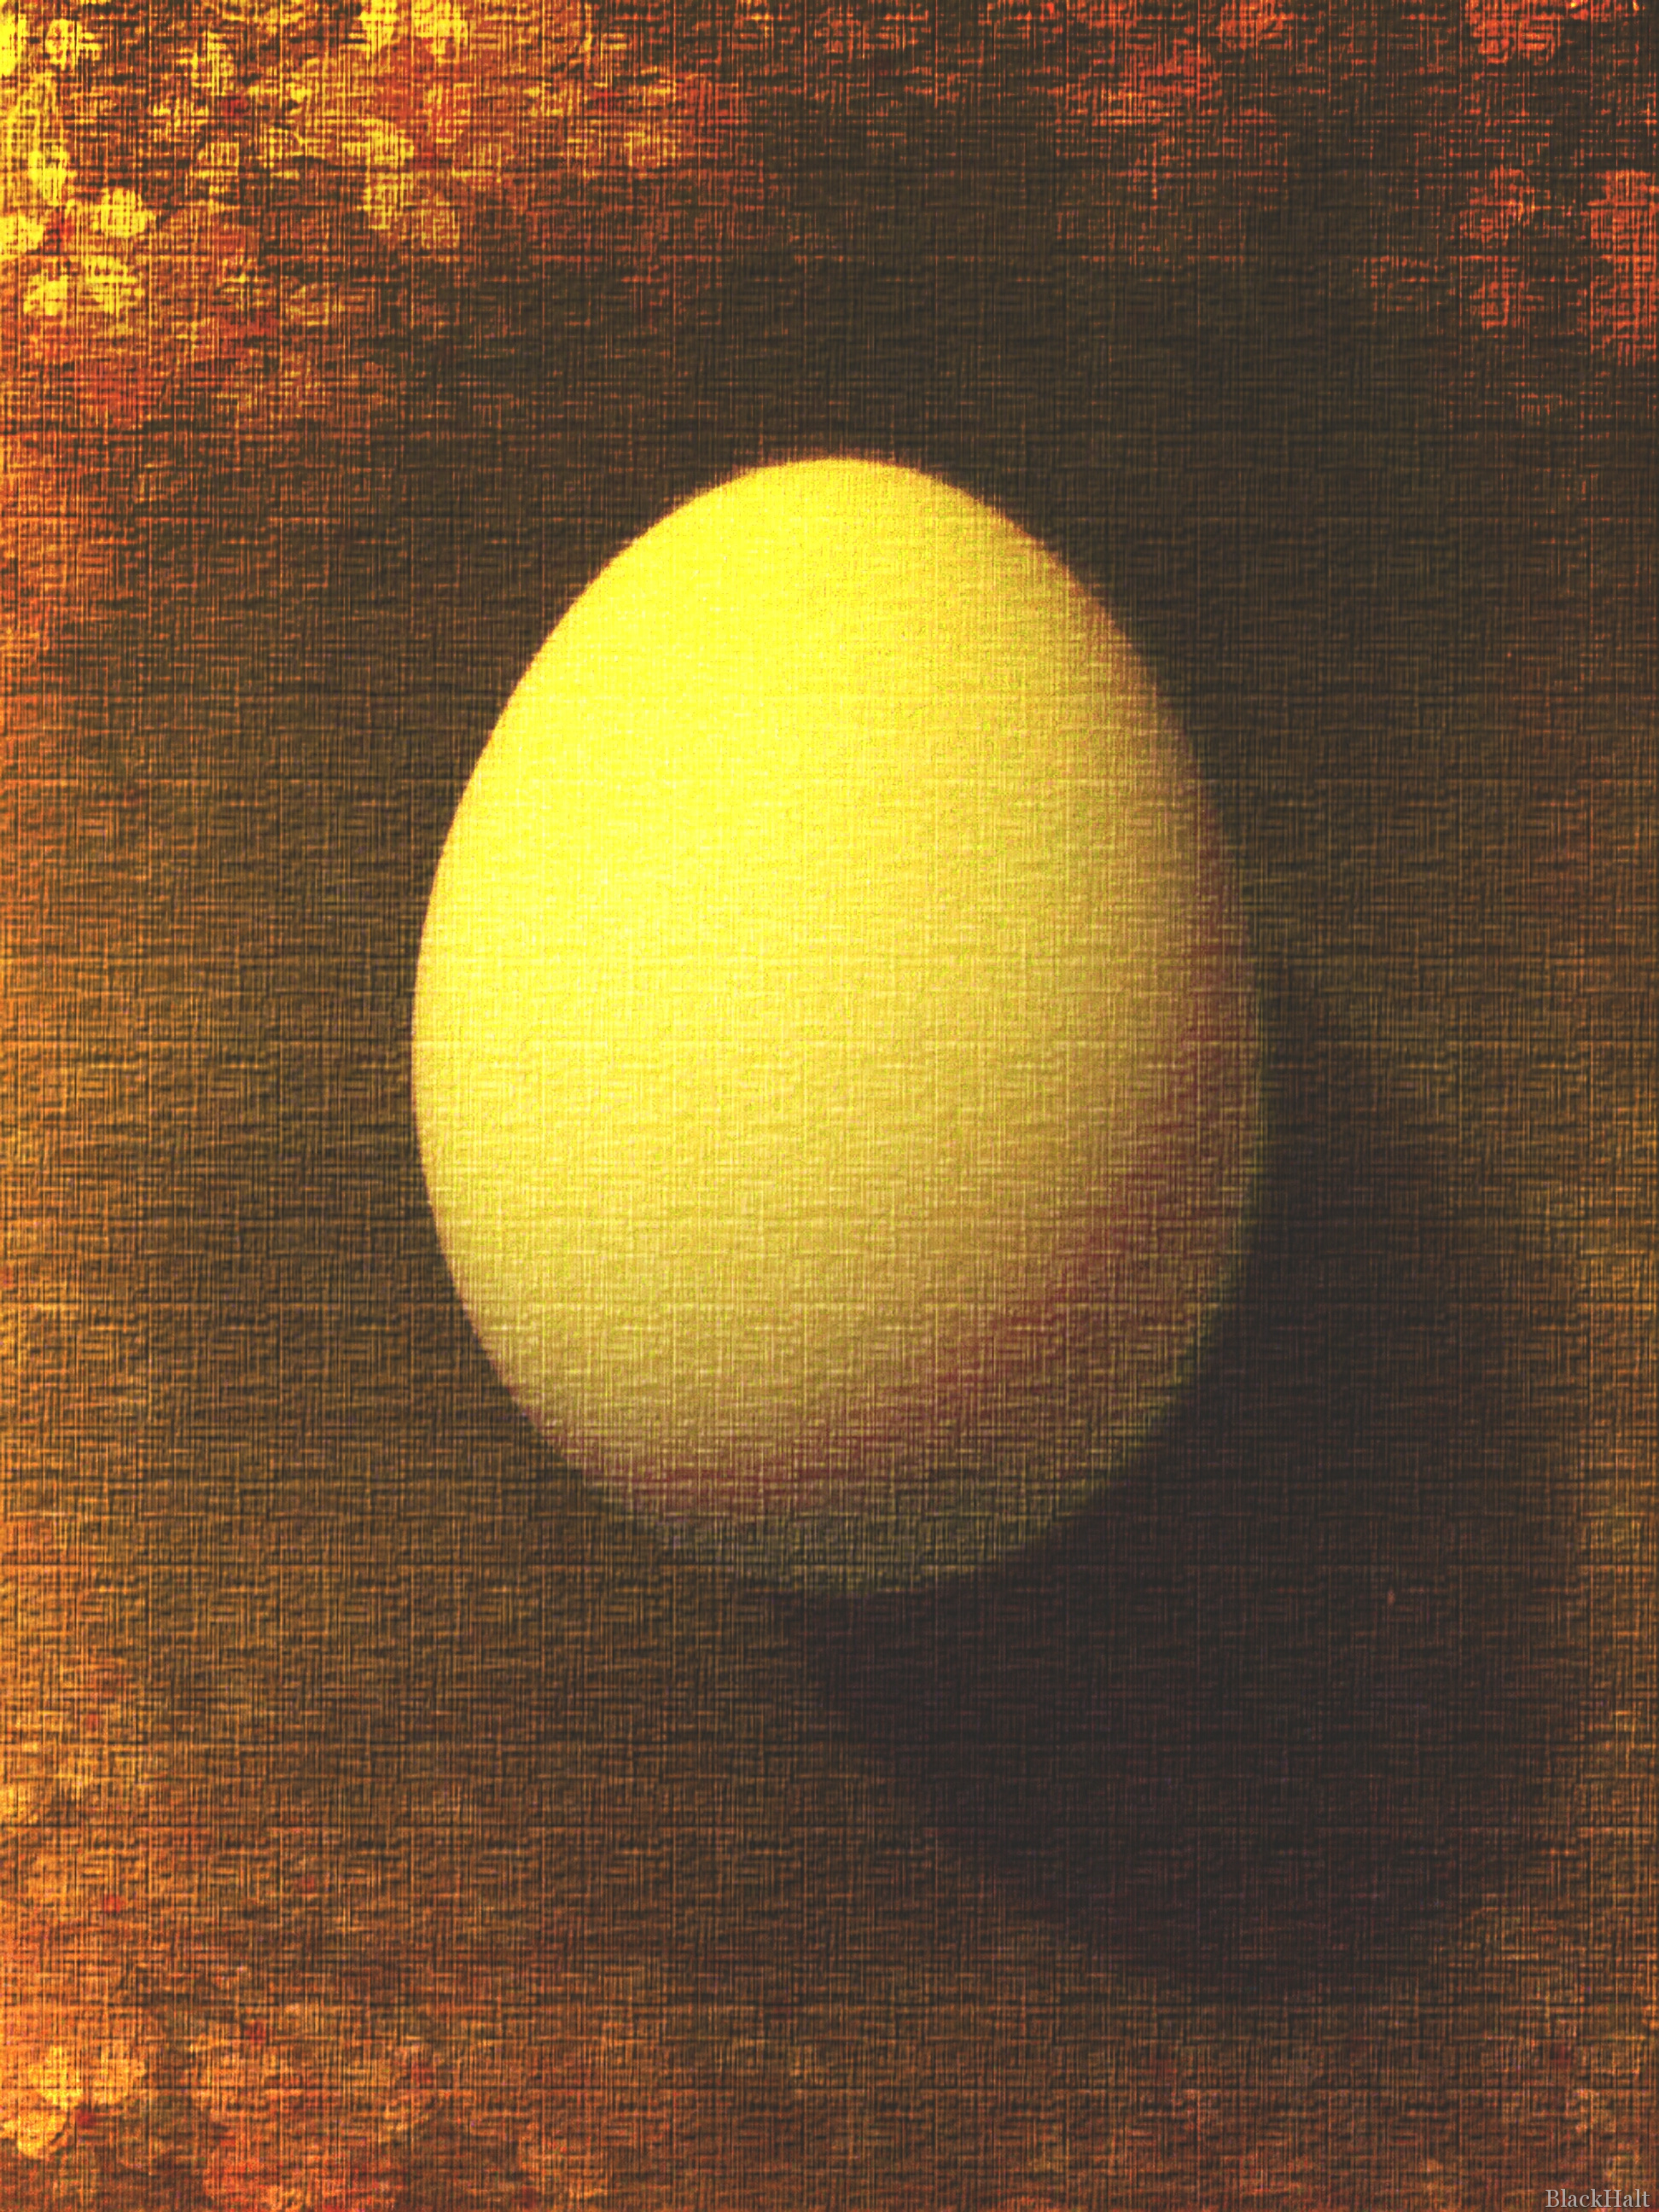 Lieldienu olas Nr.2